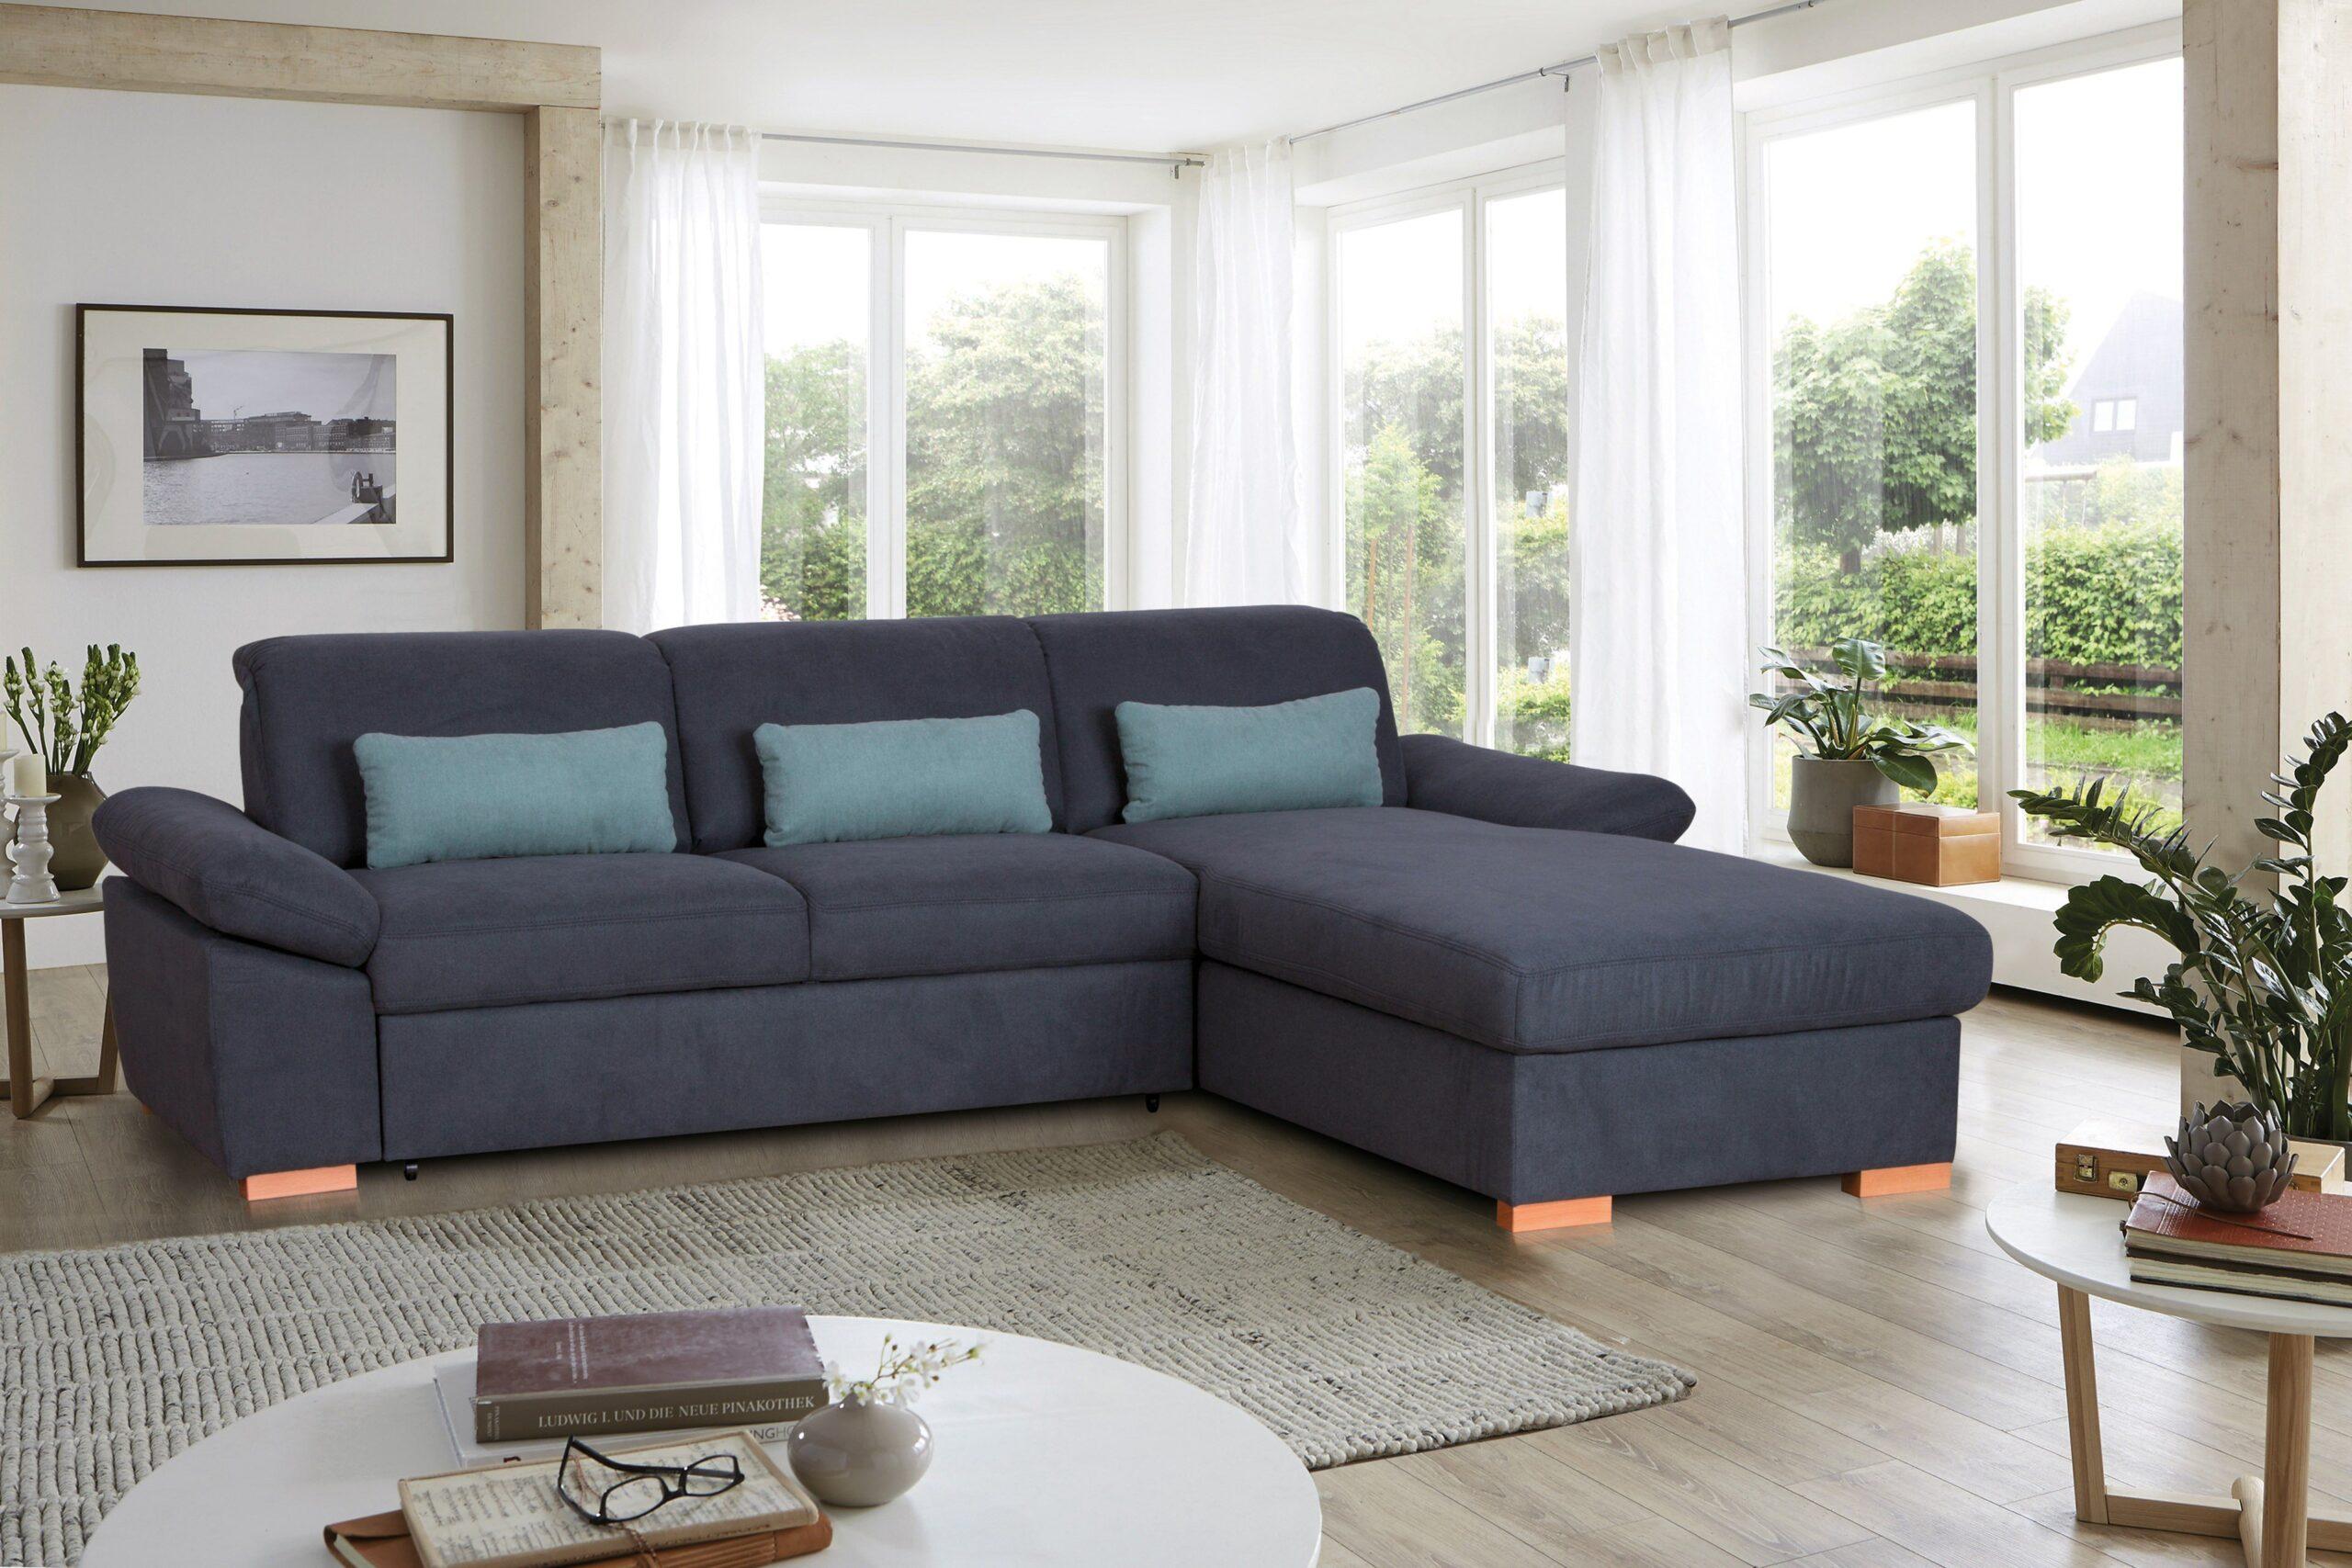 Full Size of Indomo Sofa Grant Factory Allmobile In L Form Grau Blau Mbel Letz Lagerverkauf Polster Reinigen Xxxl Günstiges Dreisitzer Relaxfunktion Xora Schlaffunktion Sofa Indomo Sofa